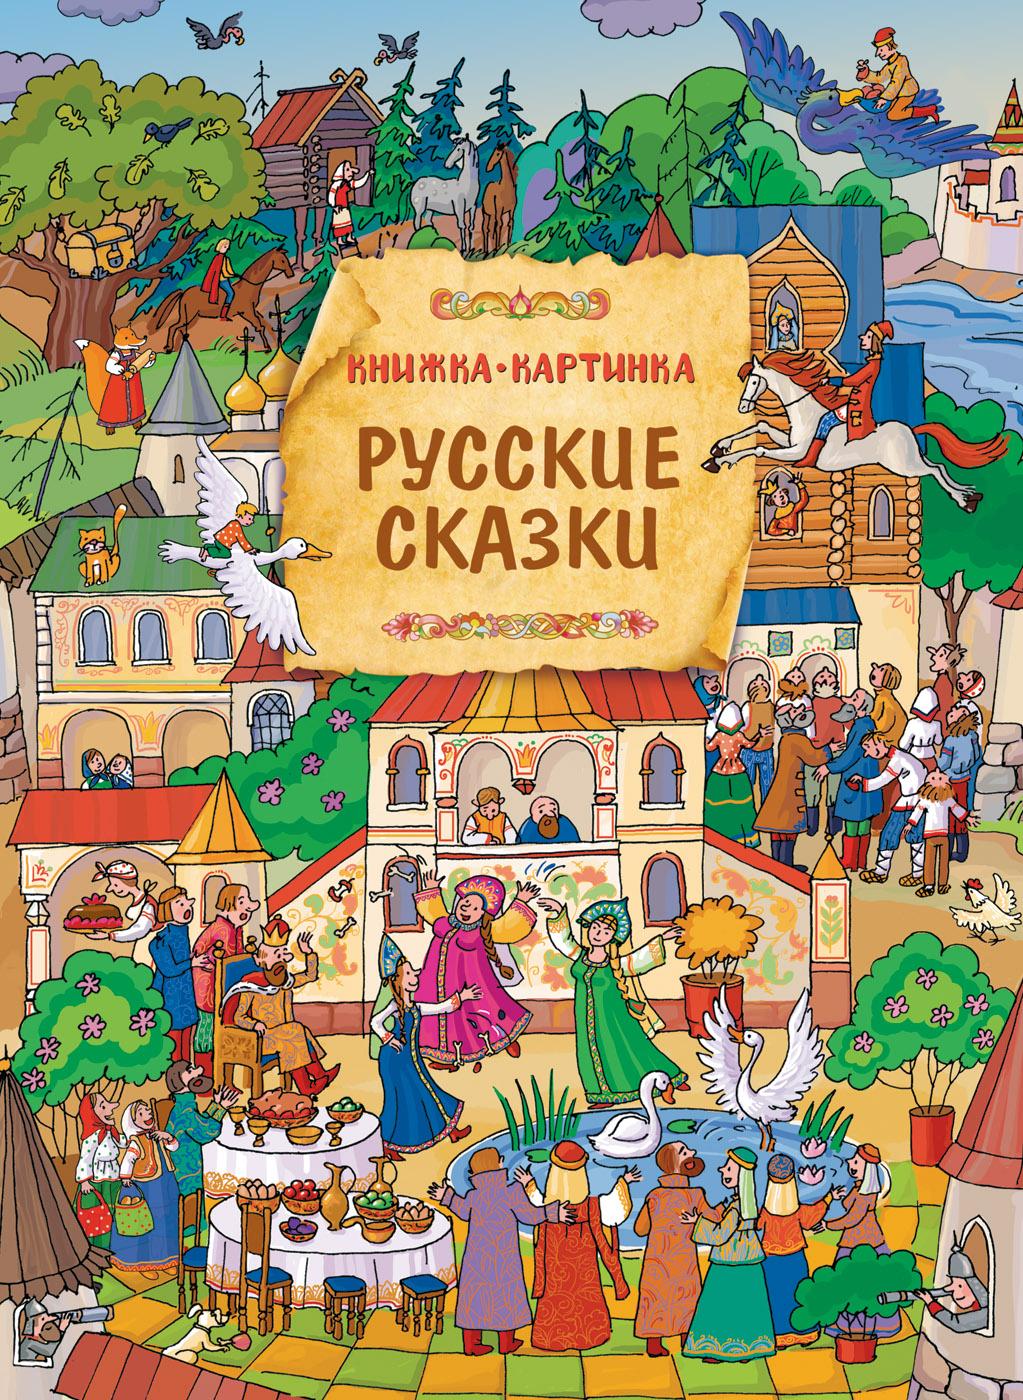 Саввушкина Т. А. Русские сказки. Виммельбух